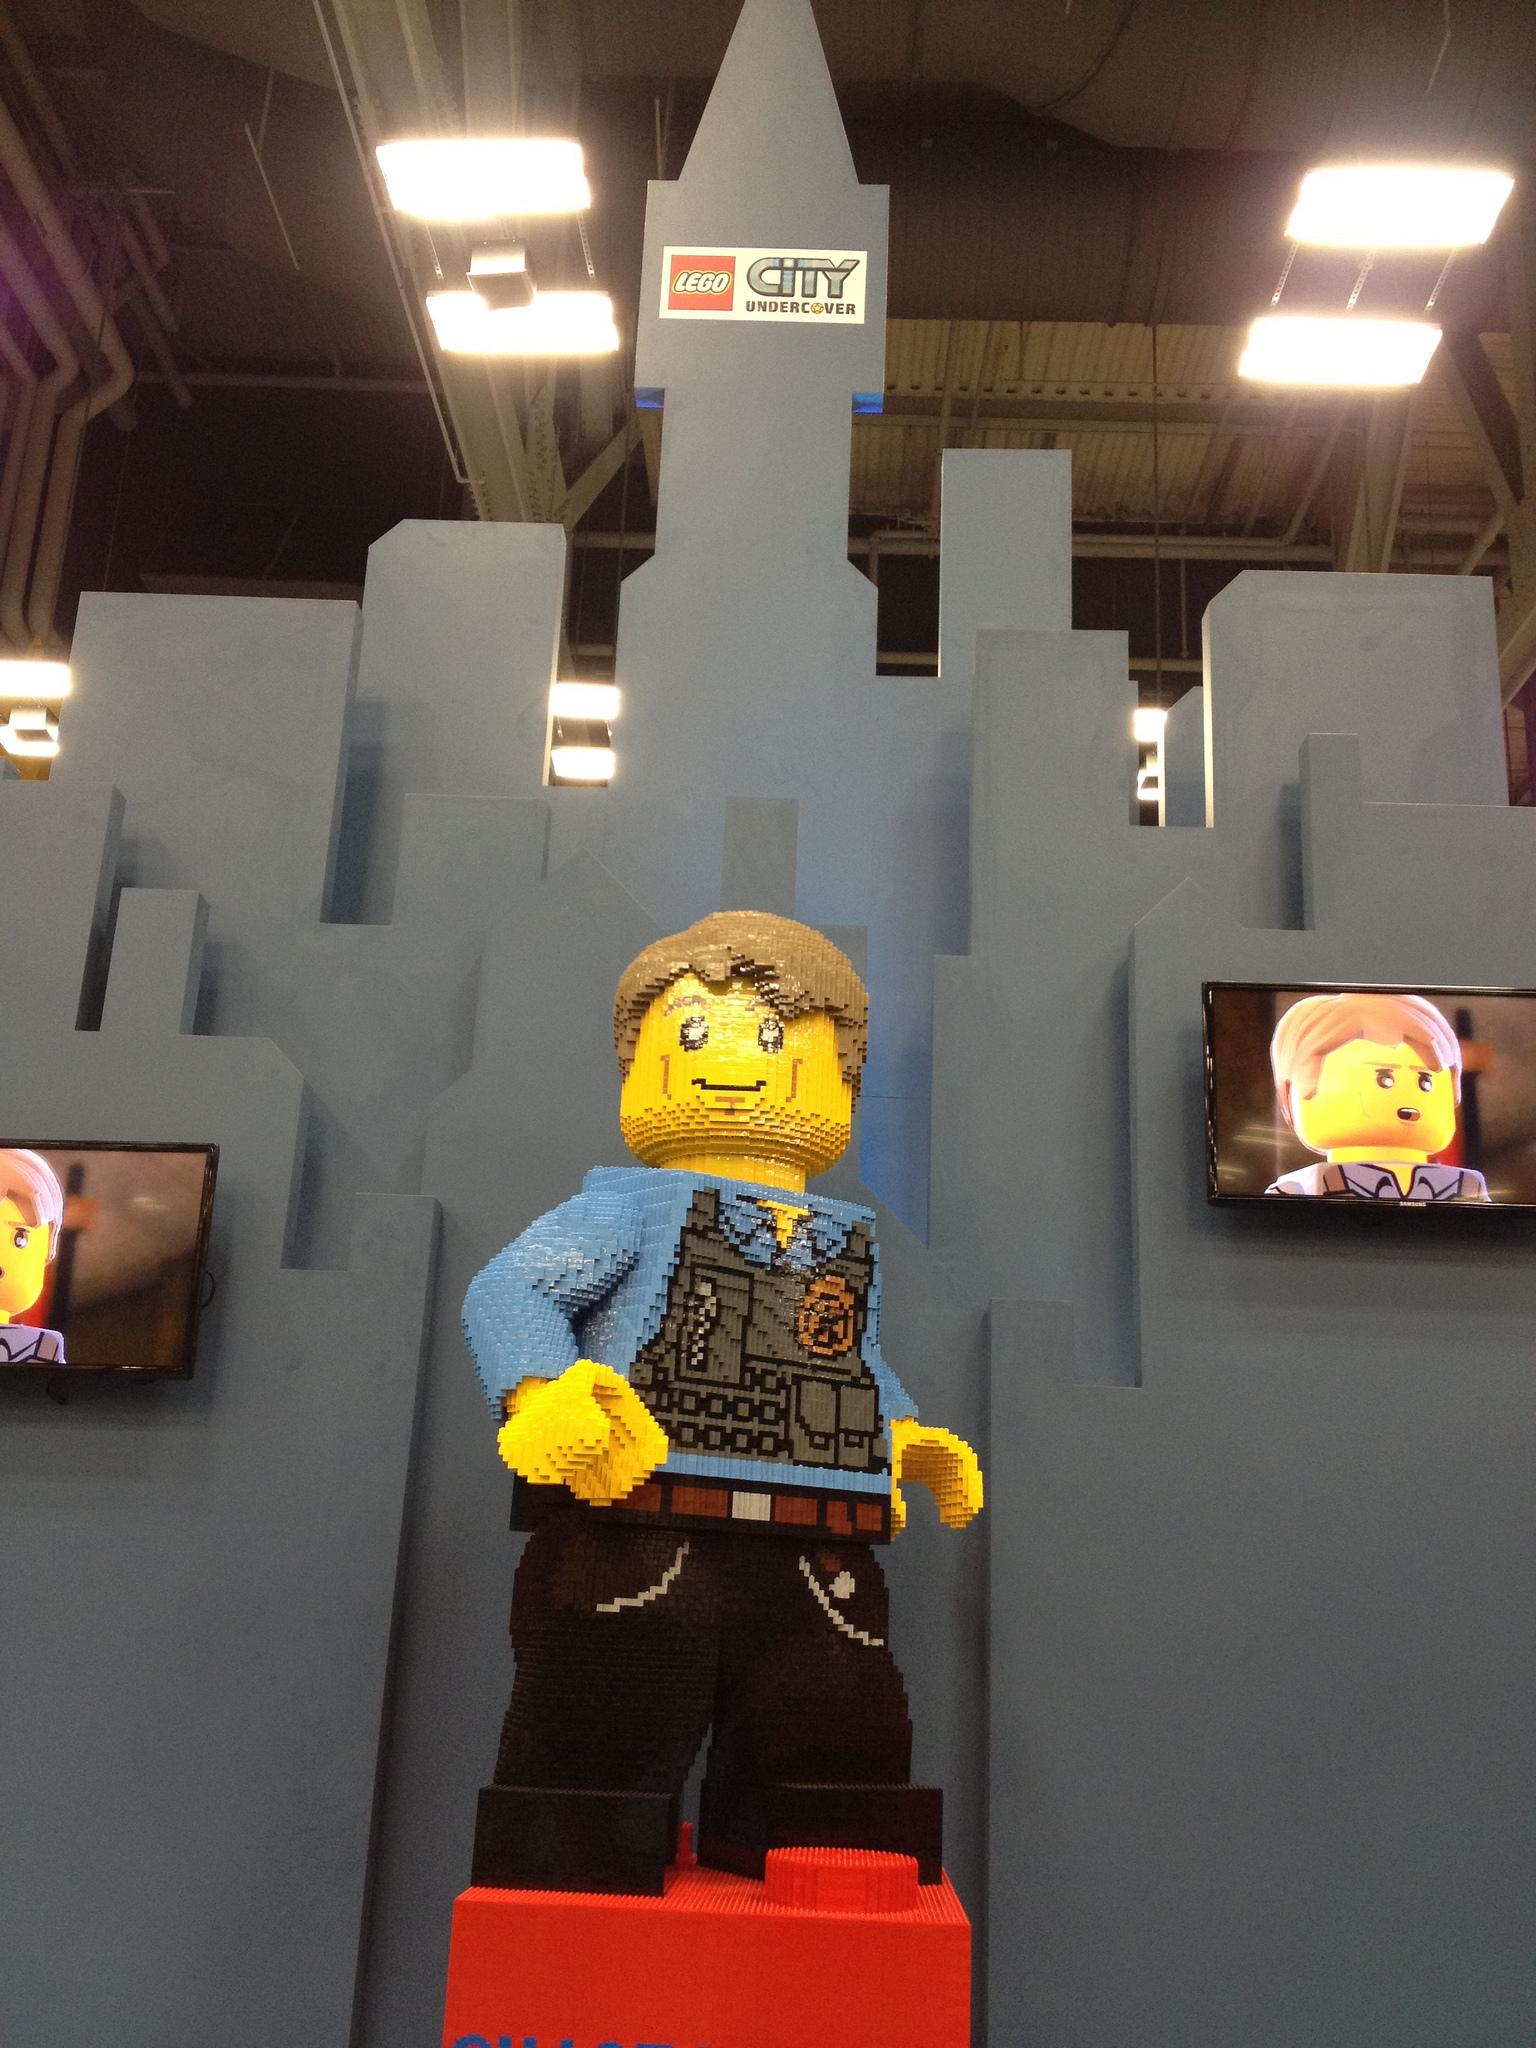 Lego City Undercover Chase Mccain Civilian A brick-built chase mccain    Lego City Undercover Chase Mccain Civilian